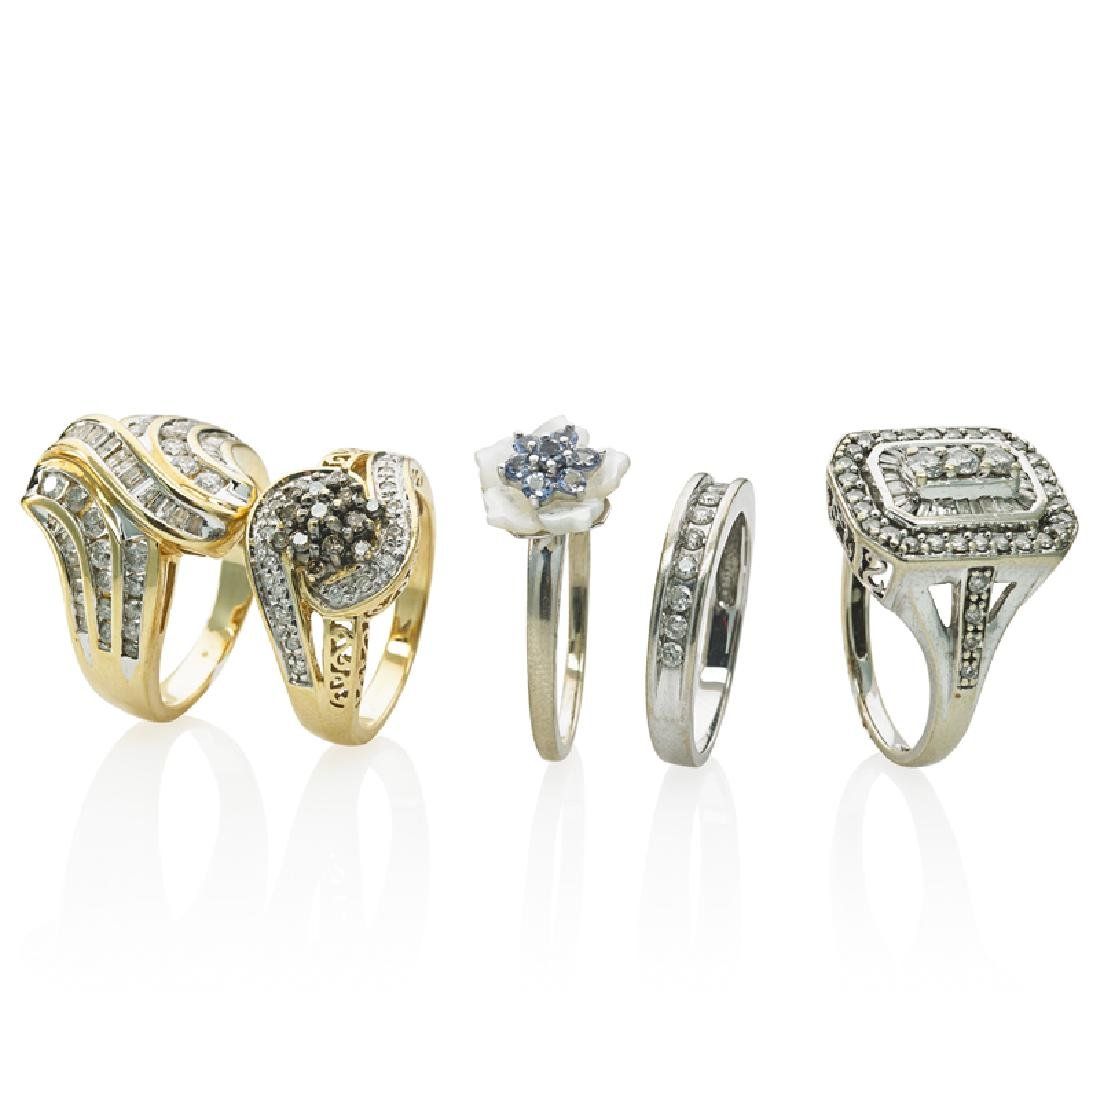 GROUP OF DIAMOND OR GEM-SET GOLD RINGS